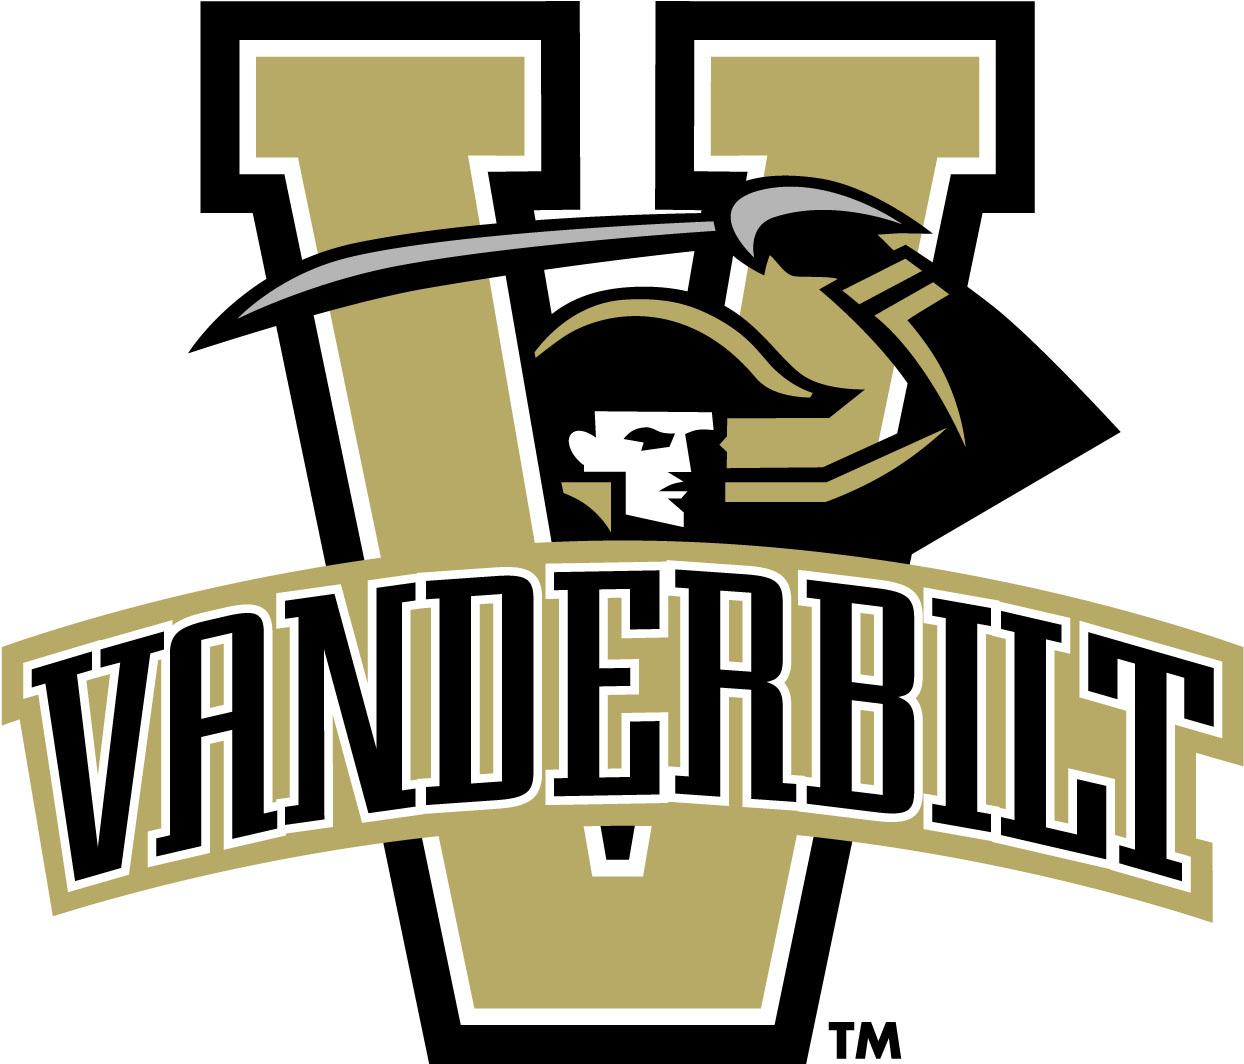 Pleasant View Christian Graduates - Vanderbilt